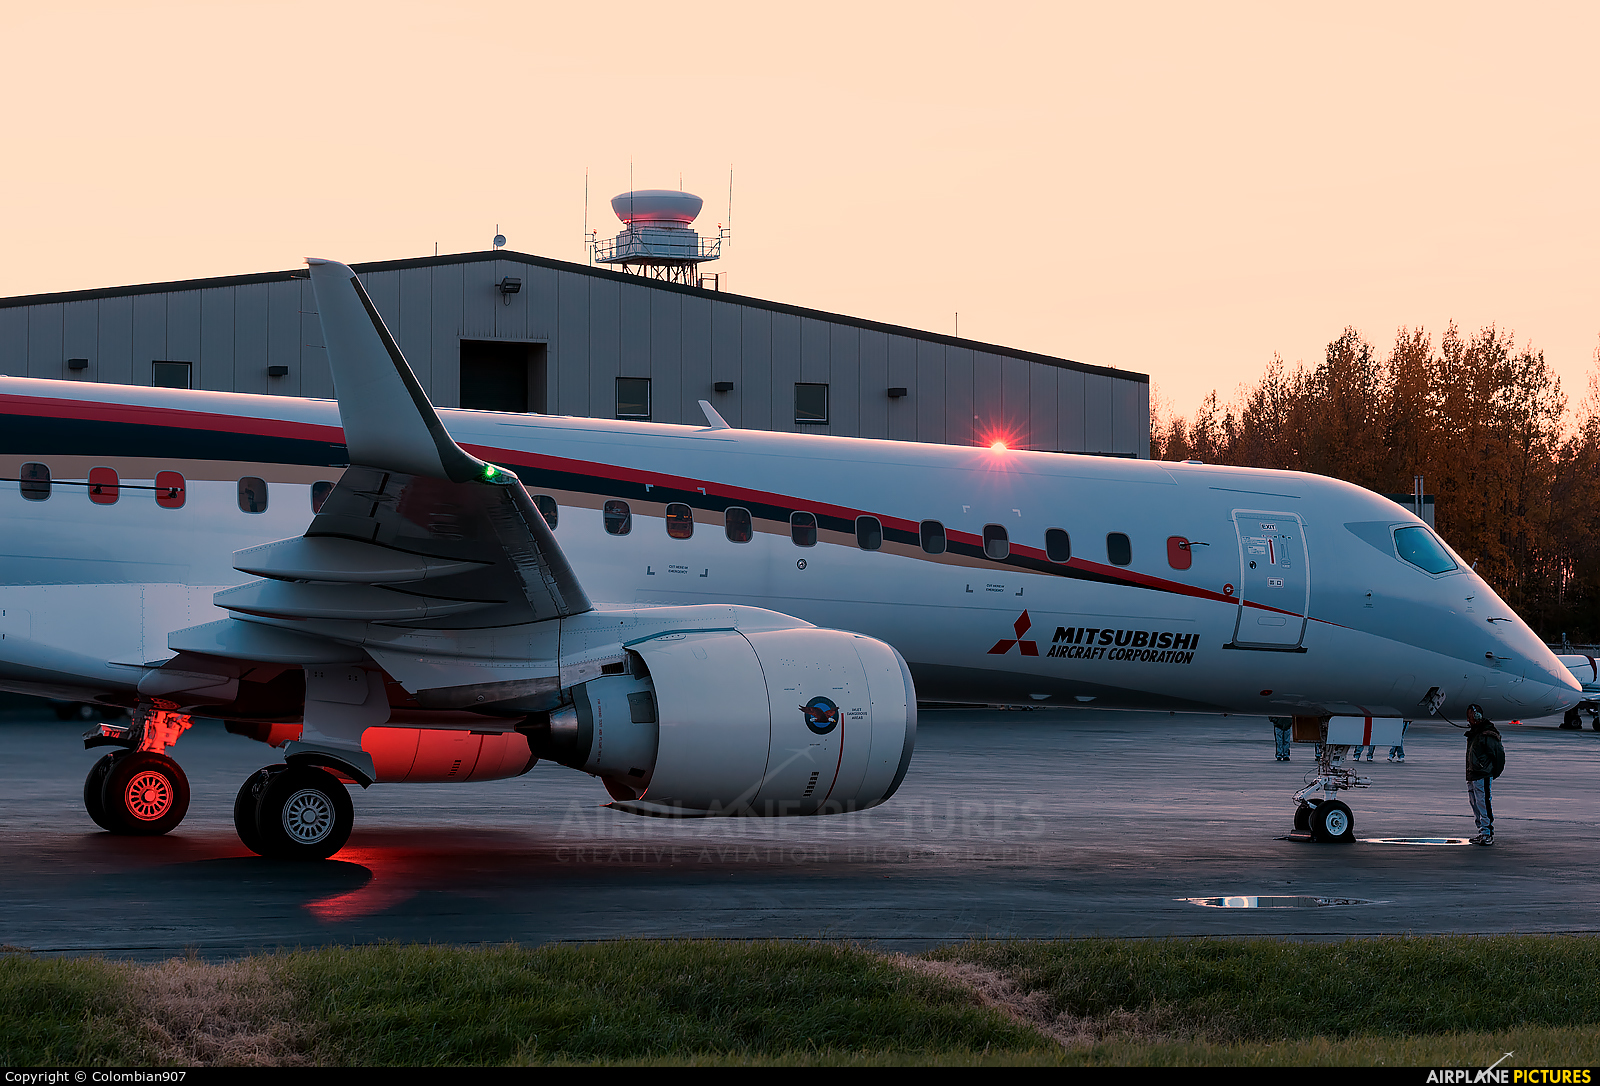 ja21mj - mitsubishi aircraft corporation mitsubishi mrj90 at